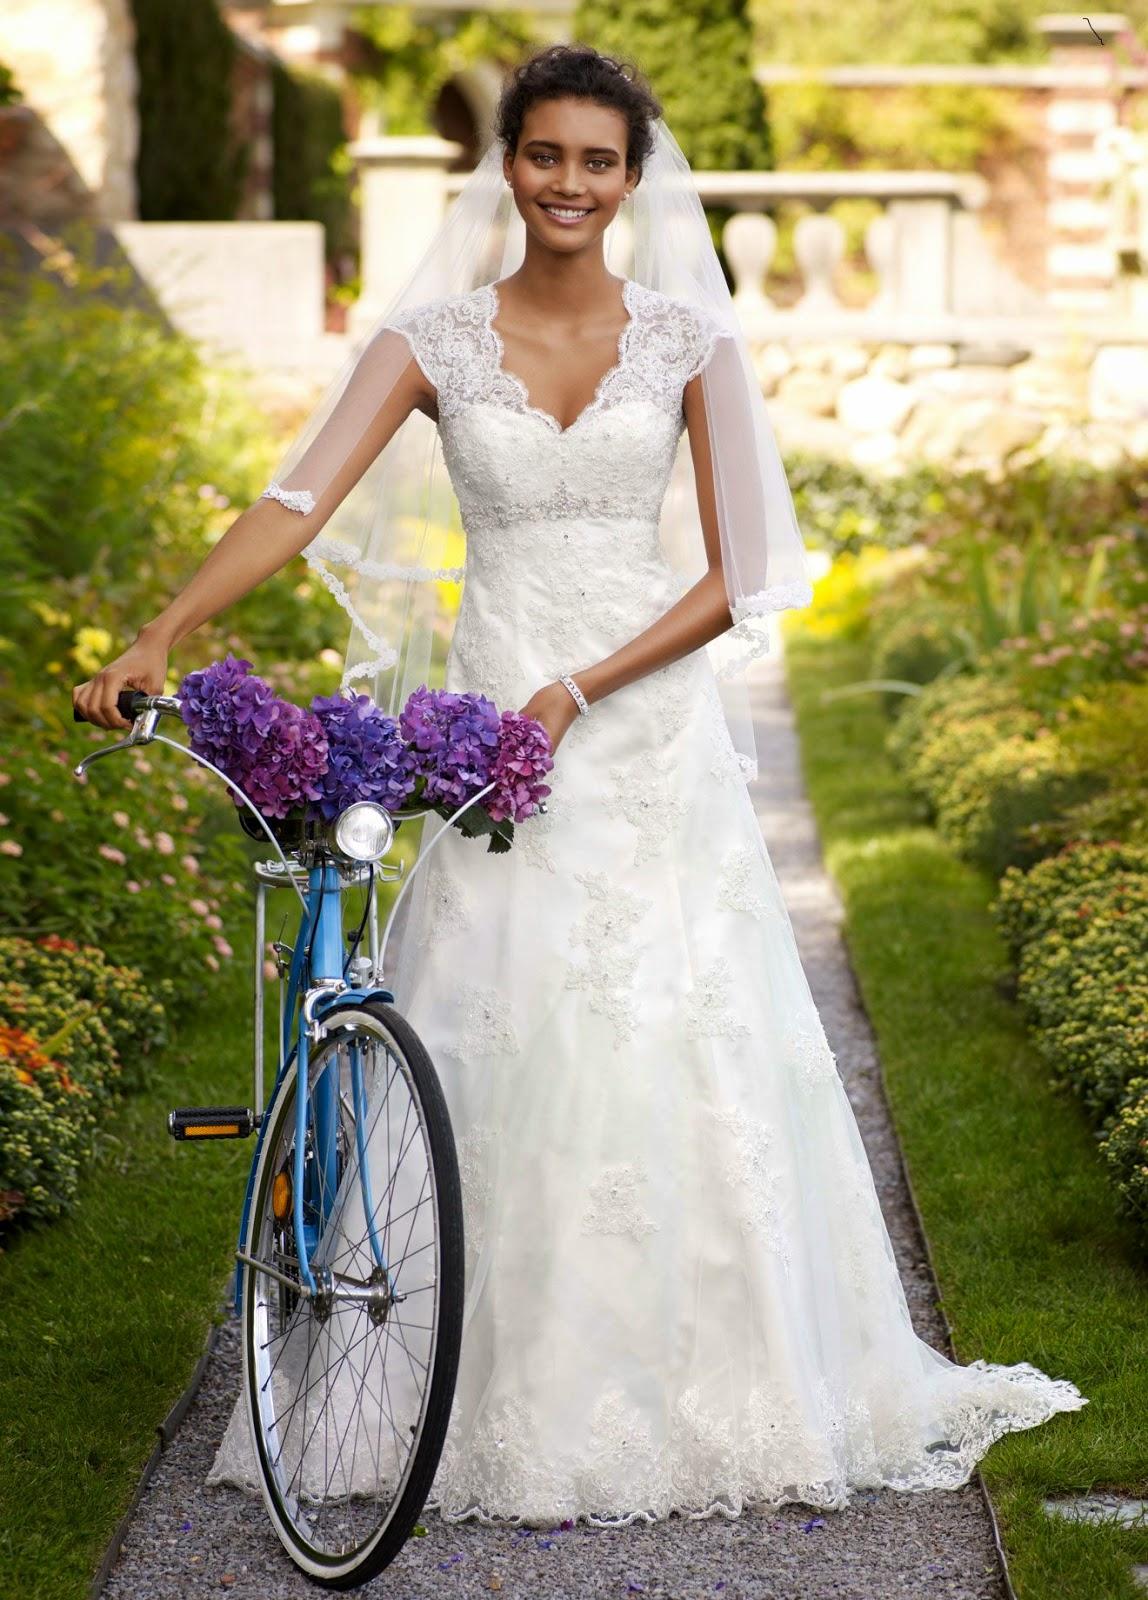 Designer Wedding Dresses  Bridal Gowns  Berketex Bride